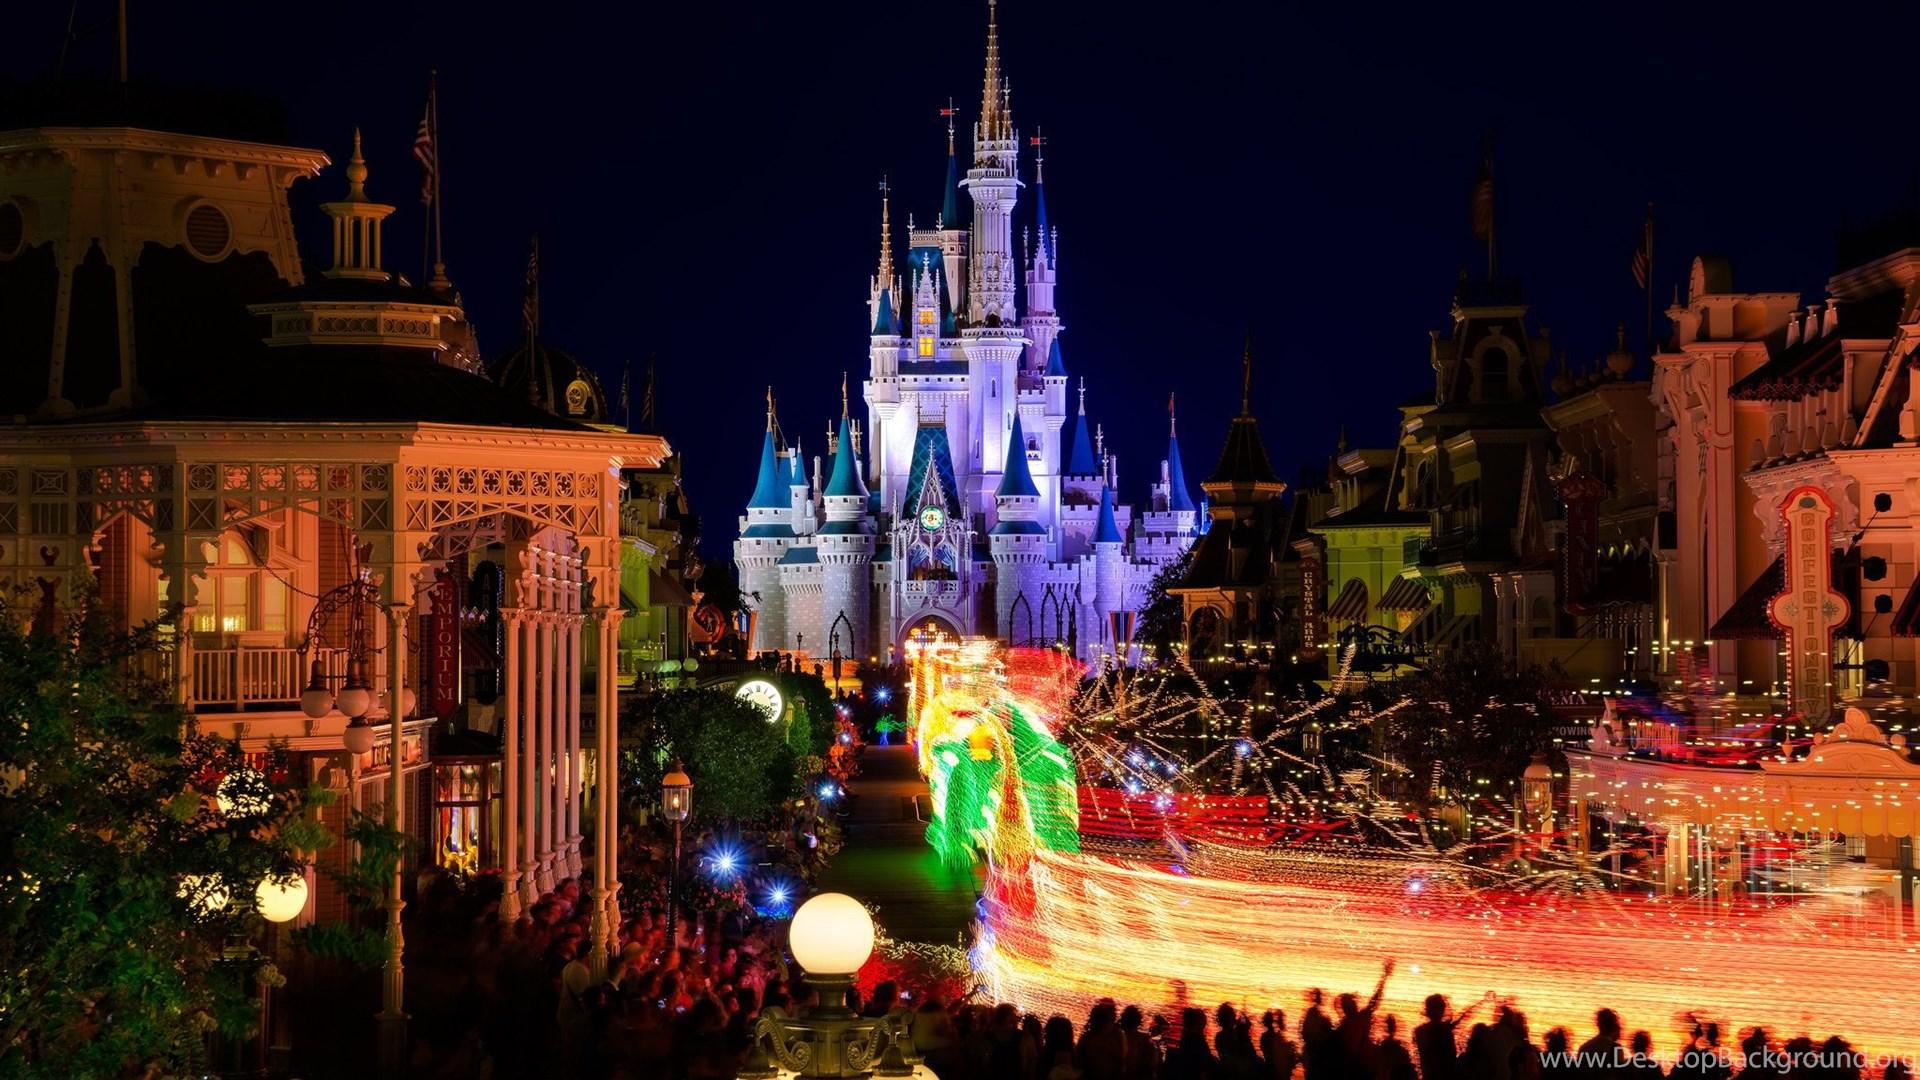 Orlando Wallpapers Disney World Cinderella Castle 3281169 Hd Wallpaper Backgrounds Download